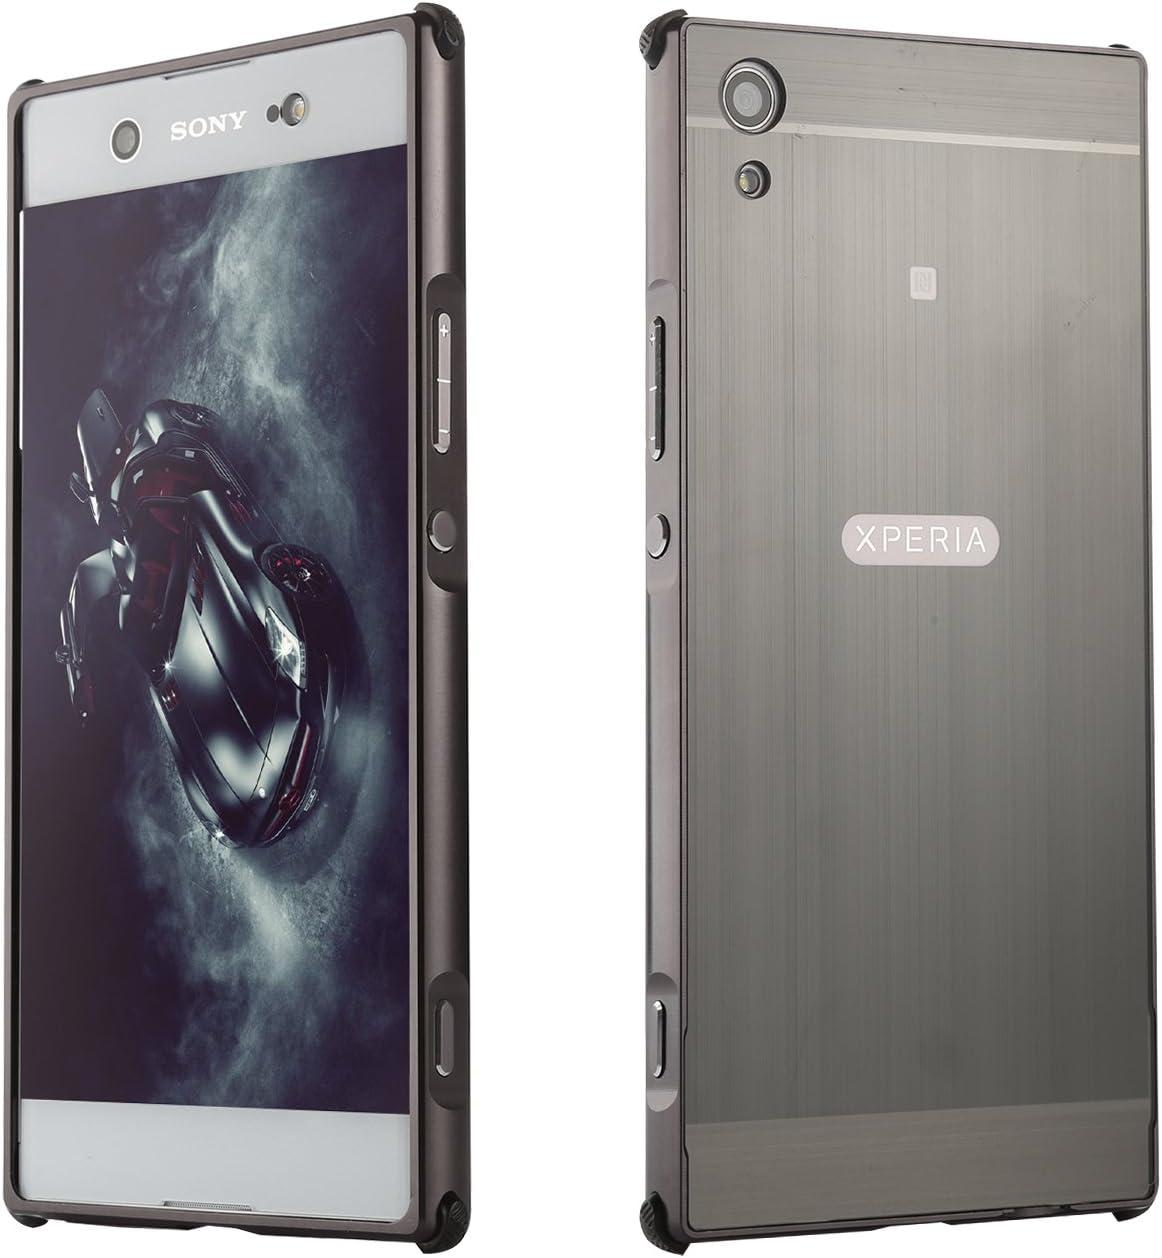 XMT Sony Xperia XA1 Ultra 6.0